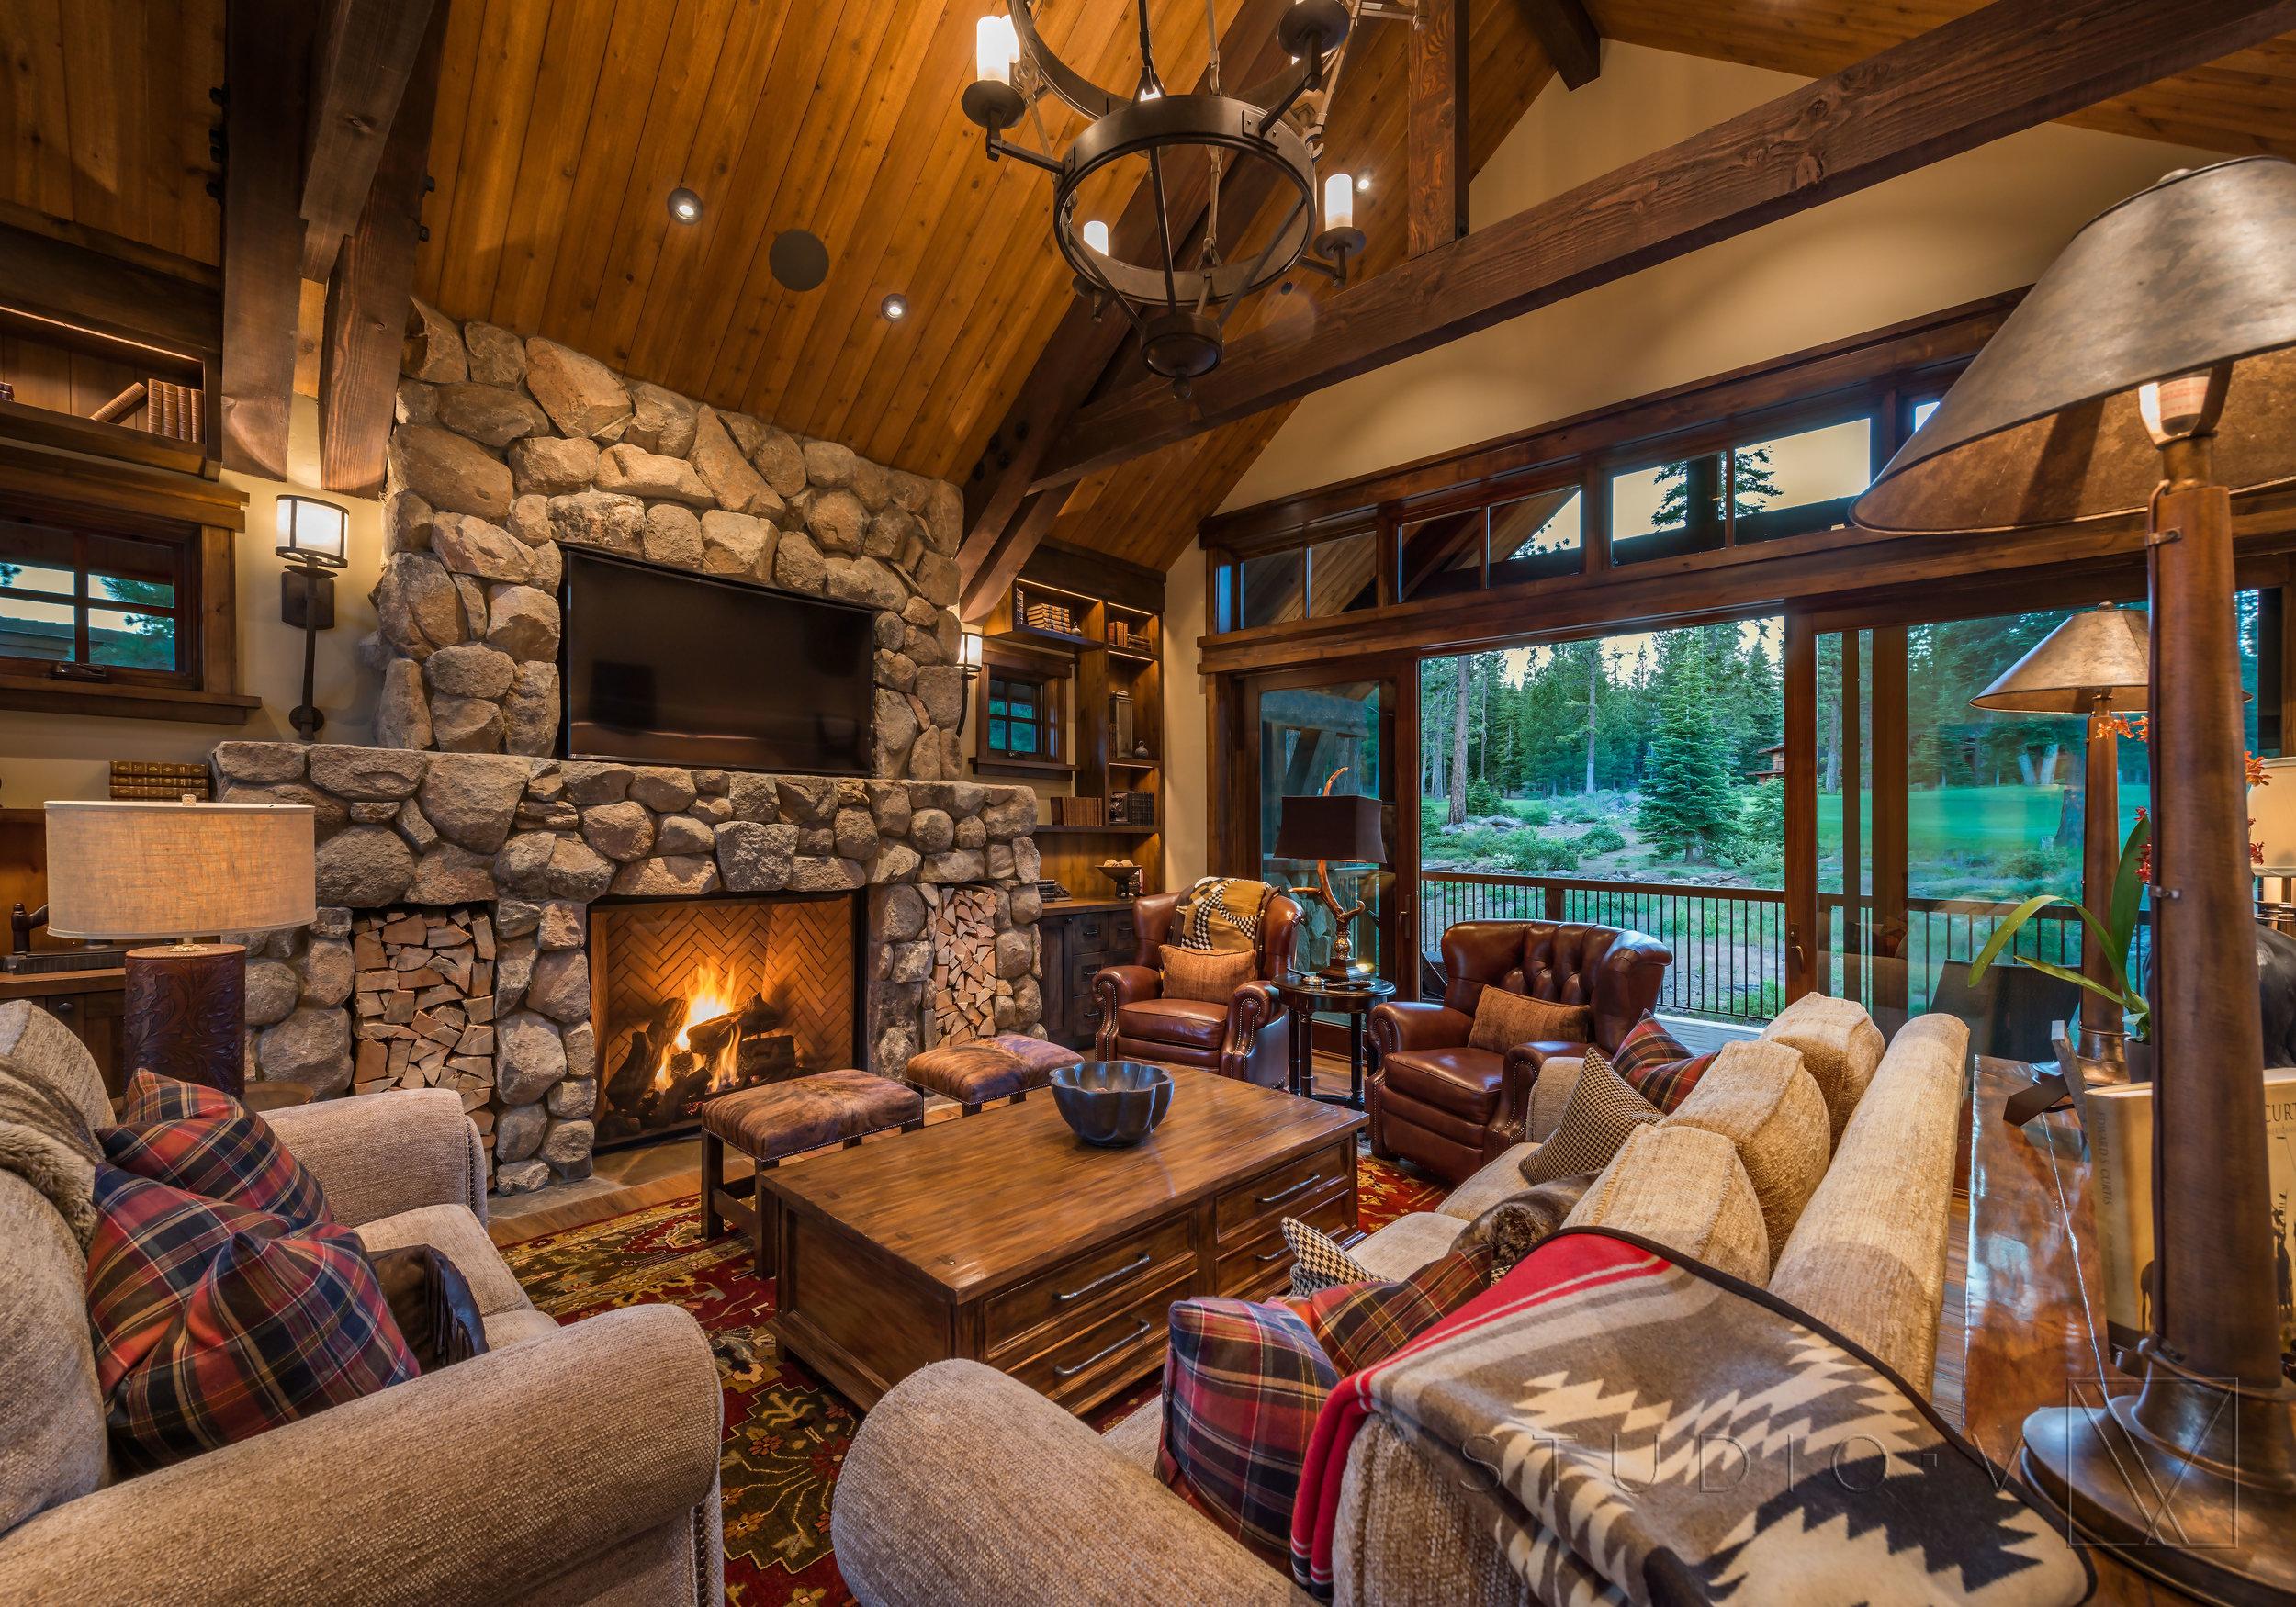 Lodge Cabin Tahoe Truckee Martis Camp CA California Traditional Studio V Interior Architecture Design Scottsdale Arizona AZ (31).jpg